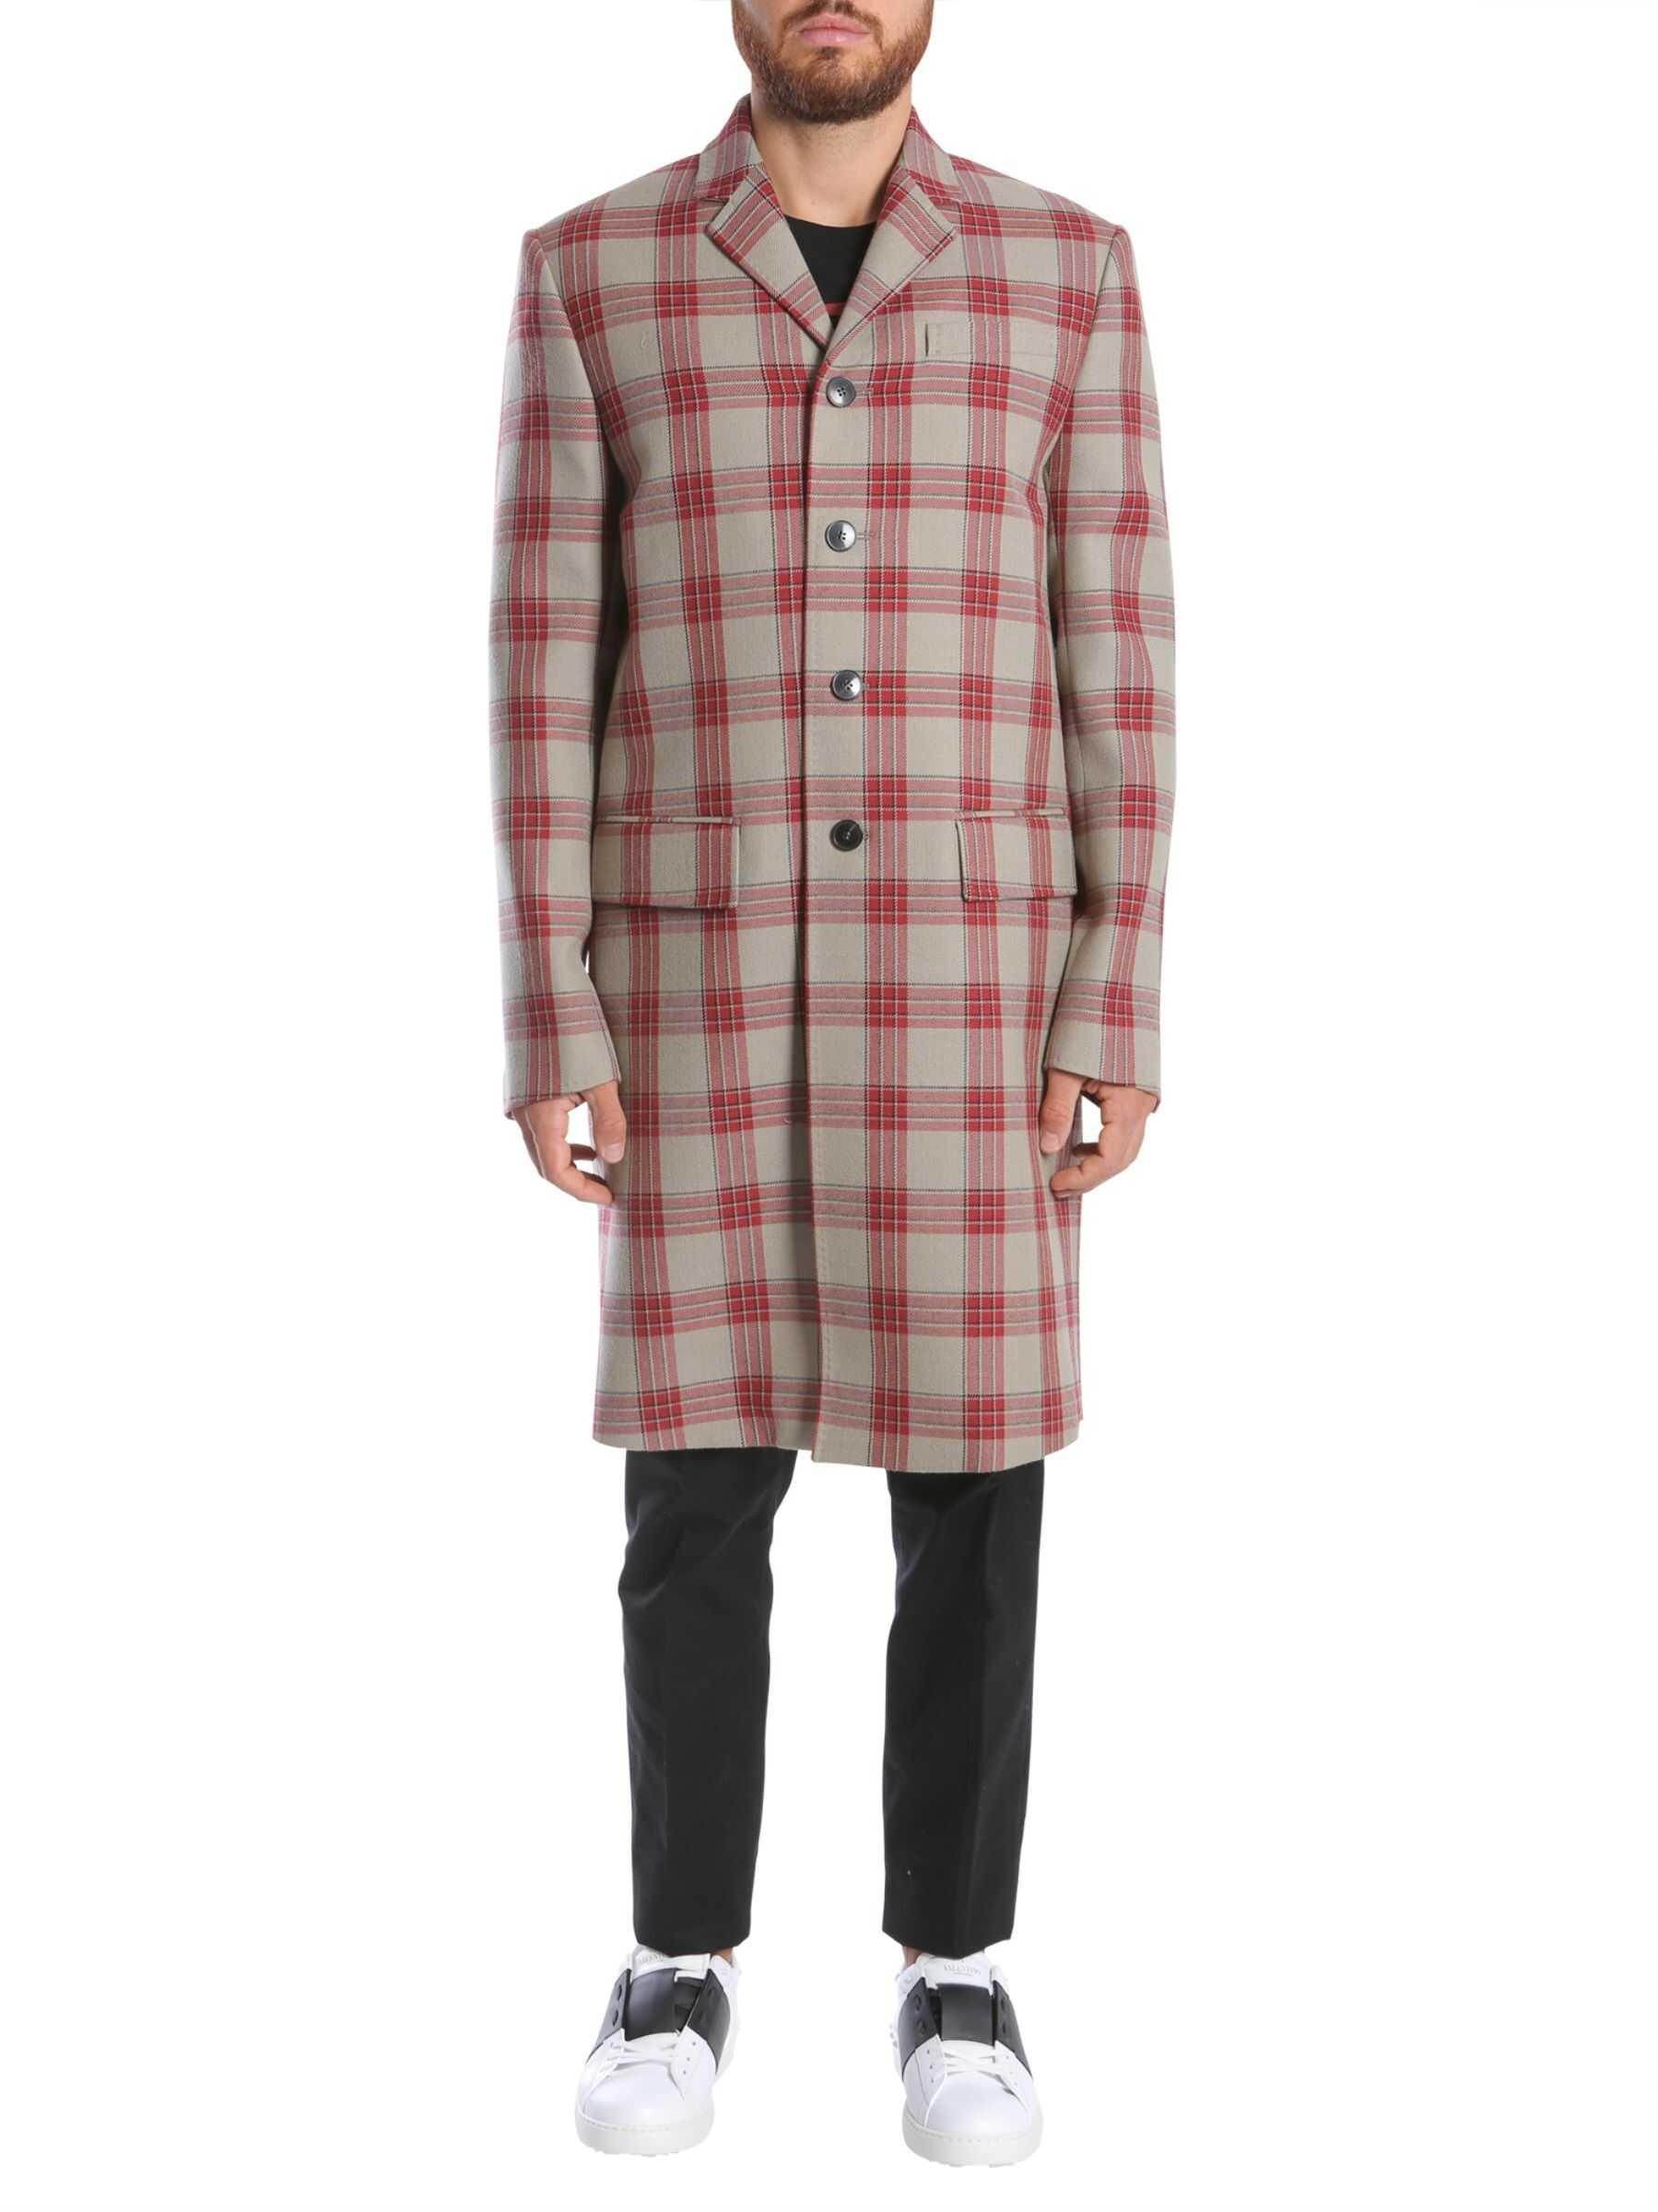 Valentino Garavani Jamie Reid Embroidered Coat BEIGE imagine